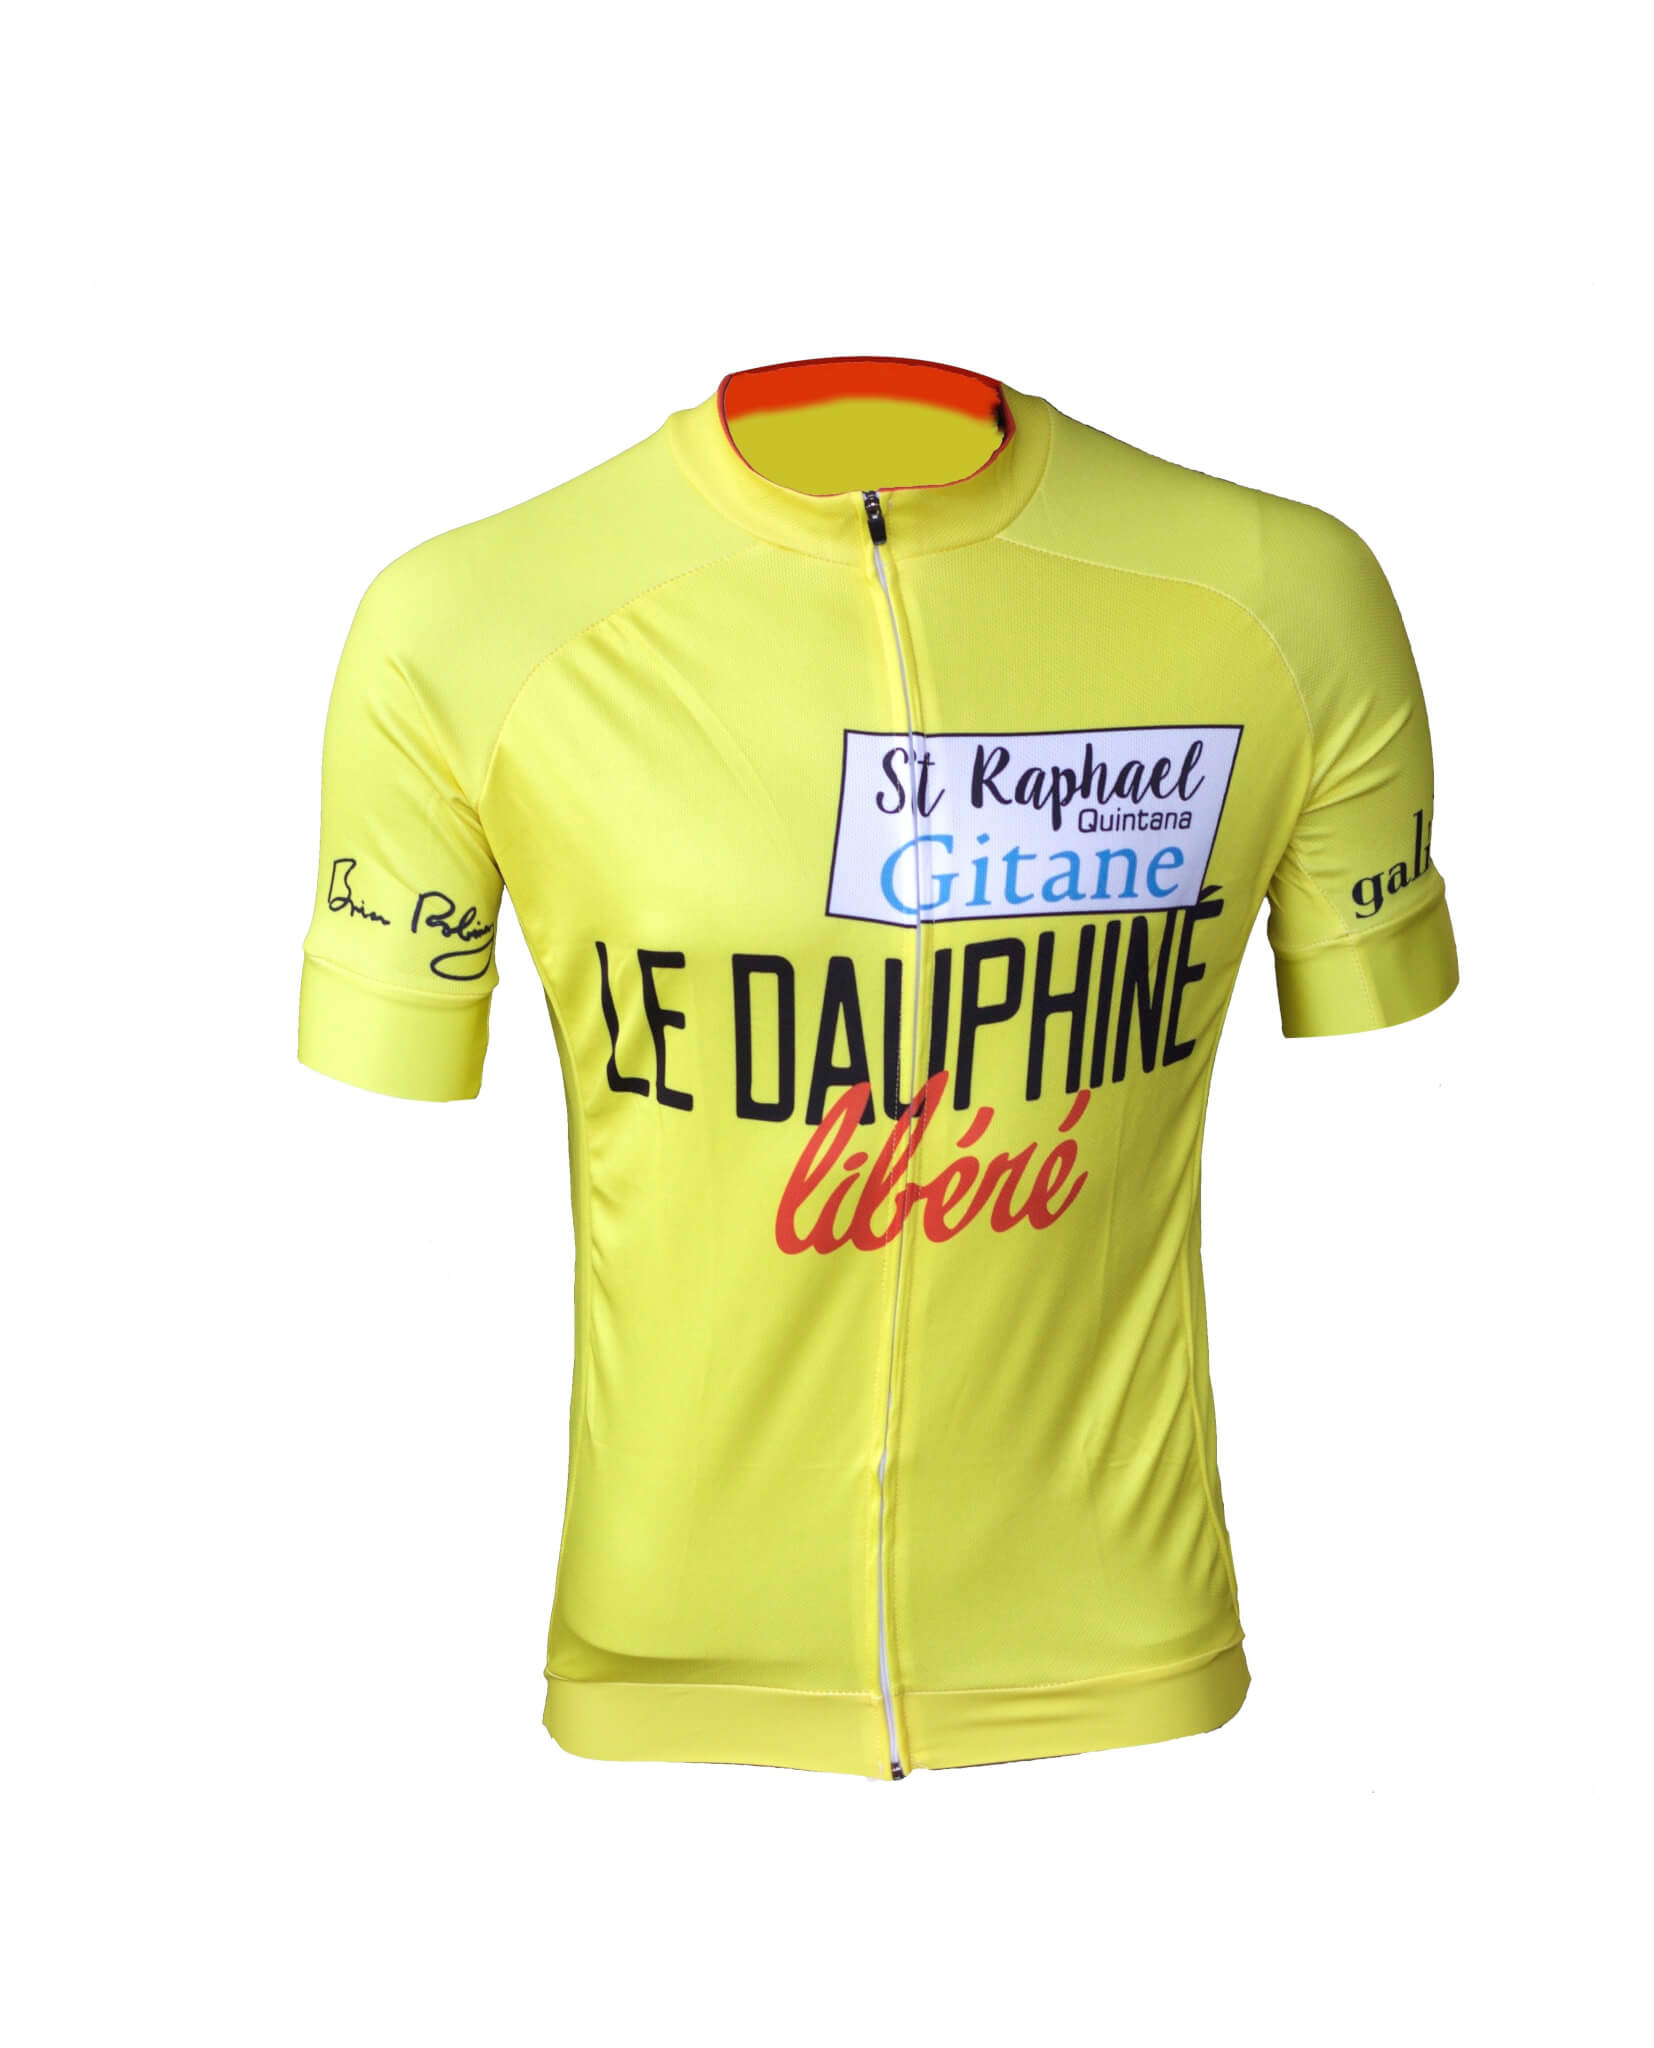 8677b1474 Brian Robinson s Dauphiné Libéré jersey.